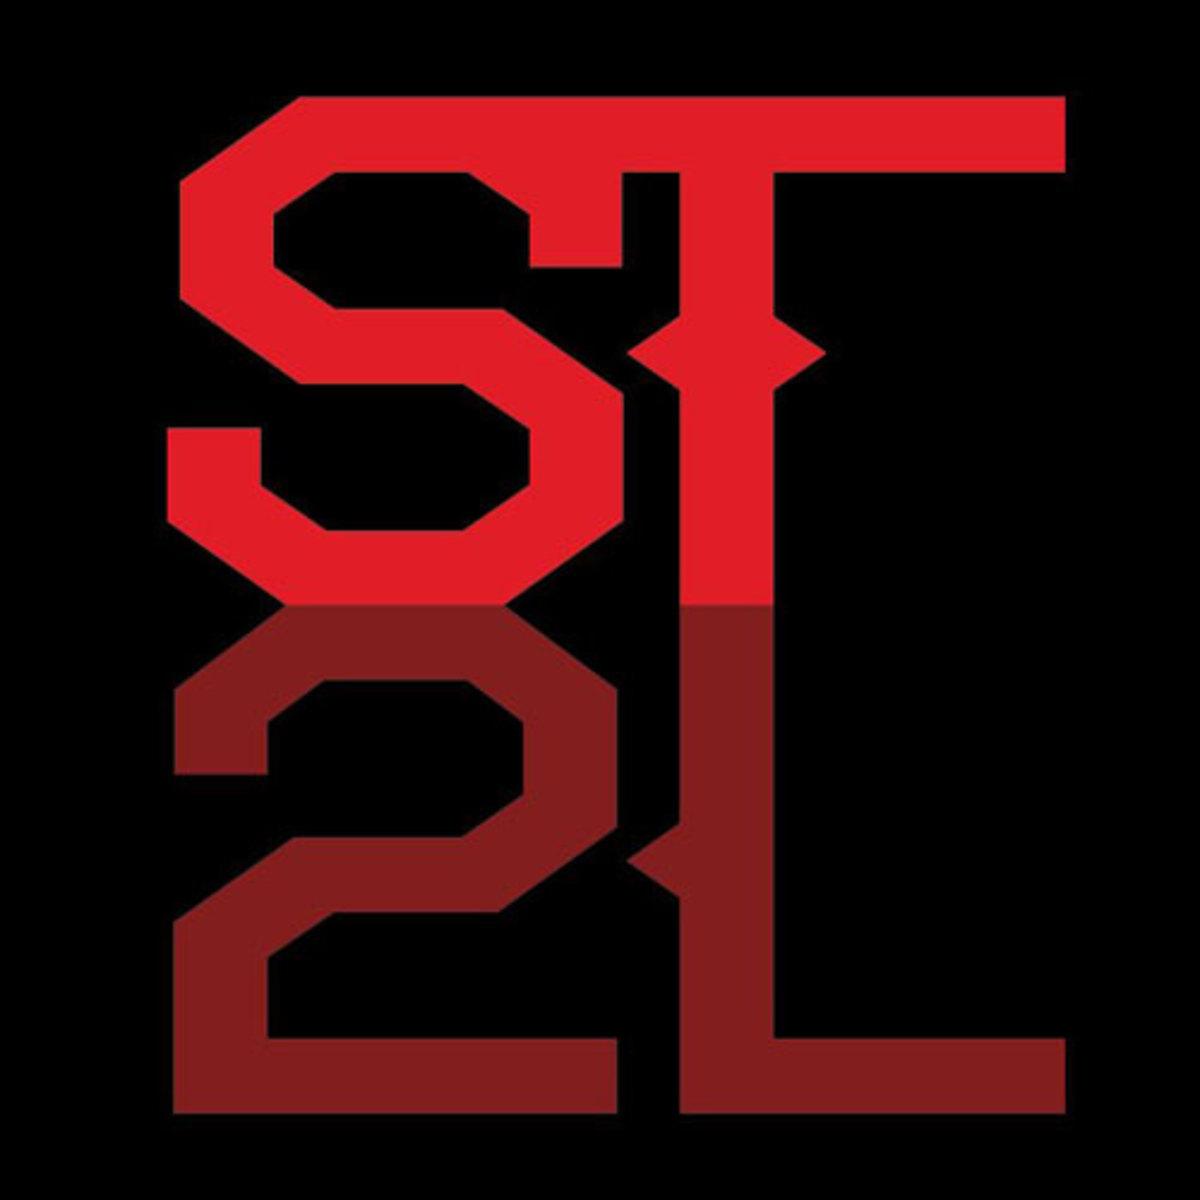 st2l.jpg